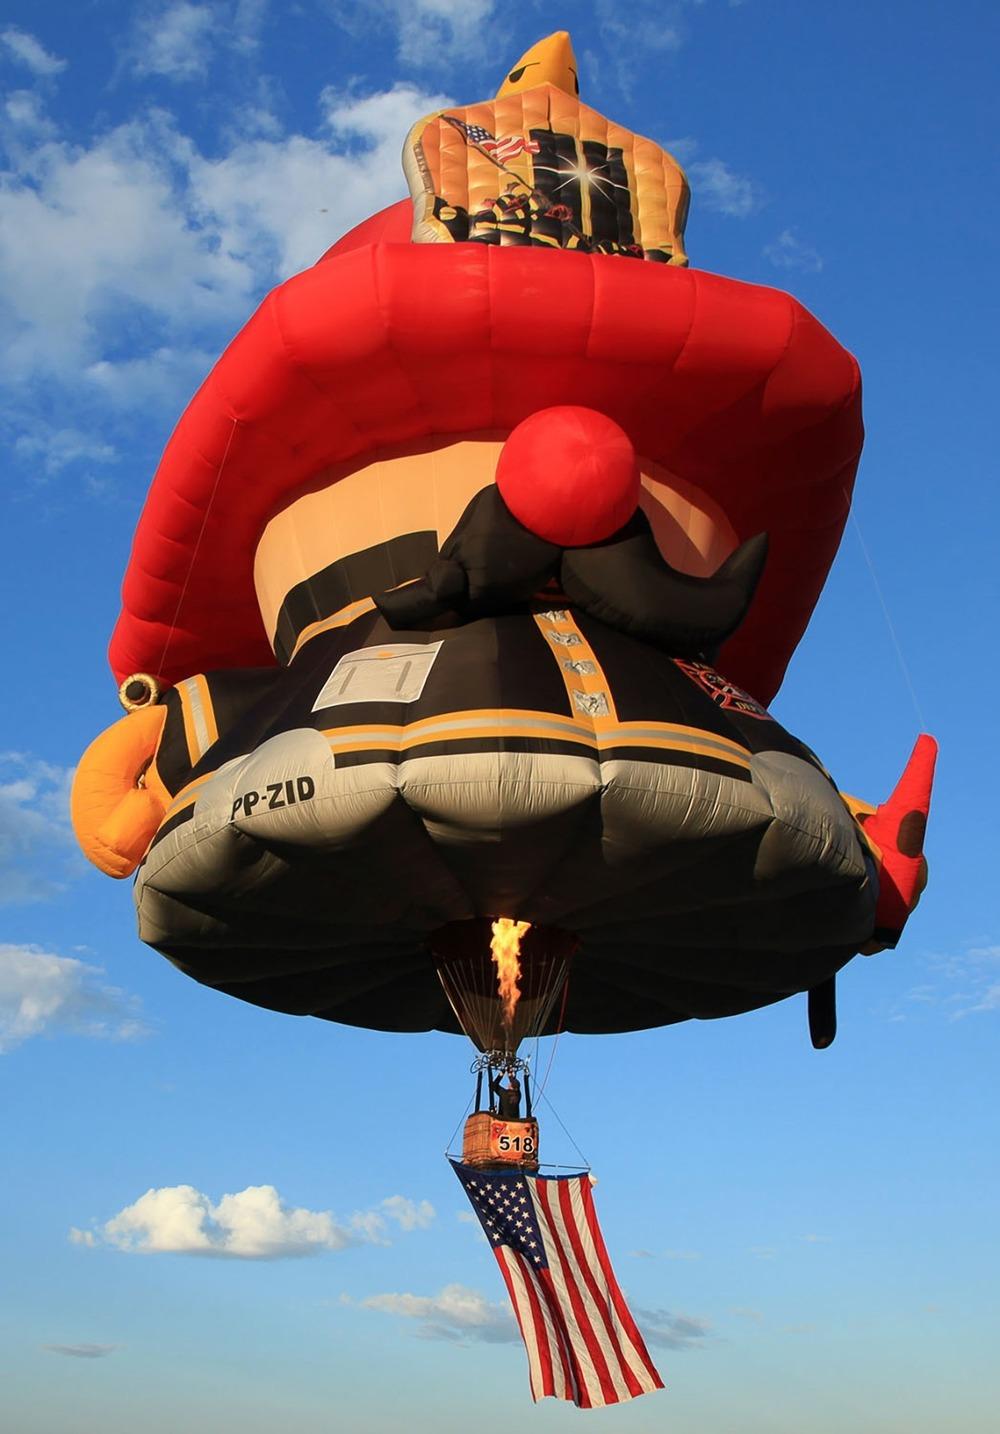 fireman+balloon-p.m.+simmons.jpg